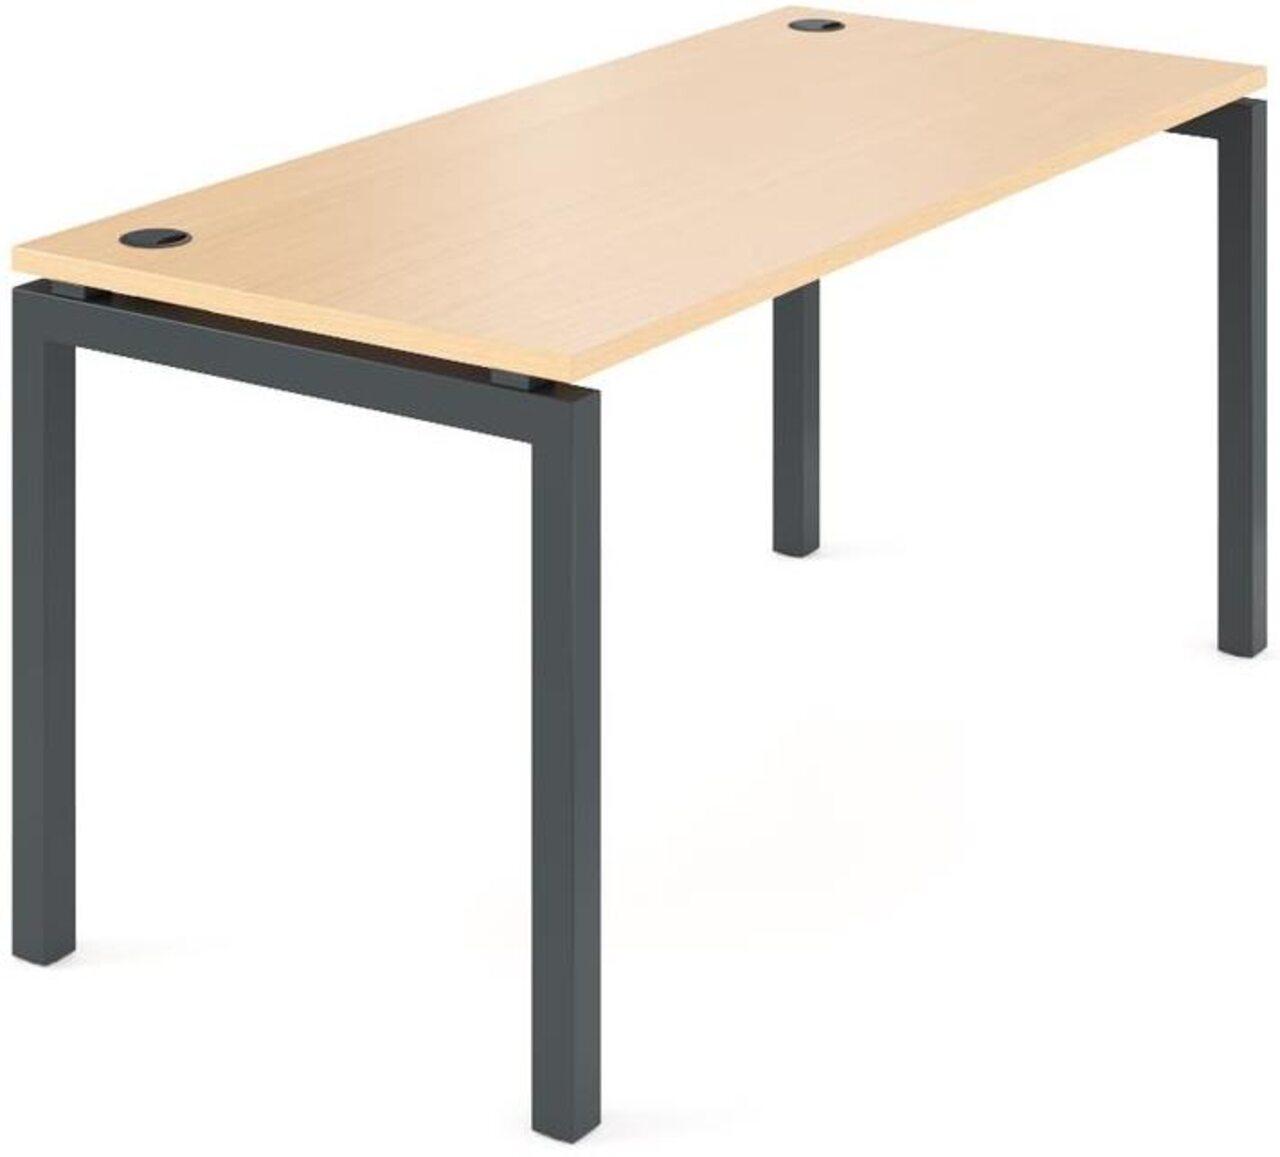 Стол на металлокаркасе  Арго 160x73x76 - фото 7